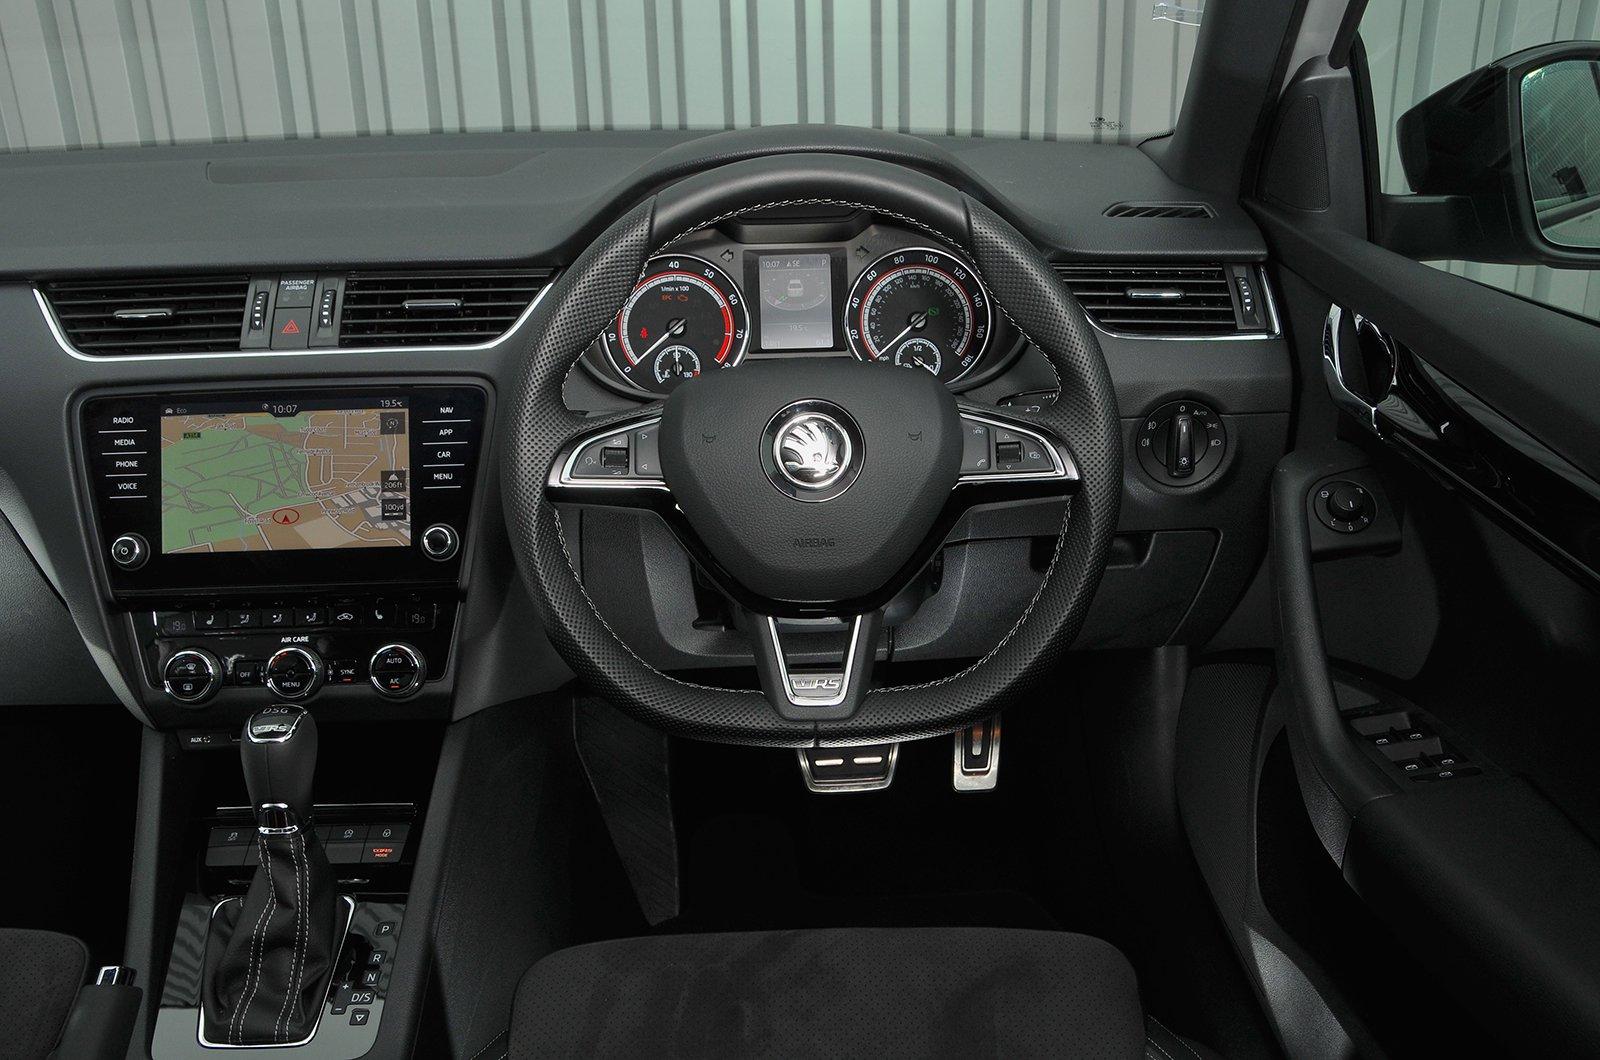 Skoda Octavia Estate 1.5 TSI SE DSG List price: - interior